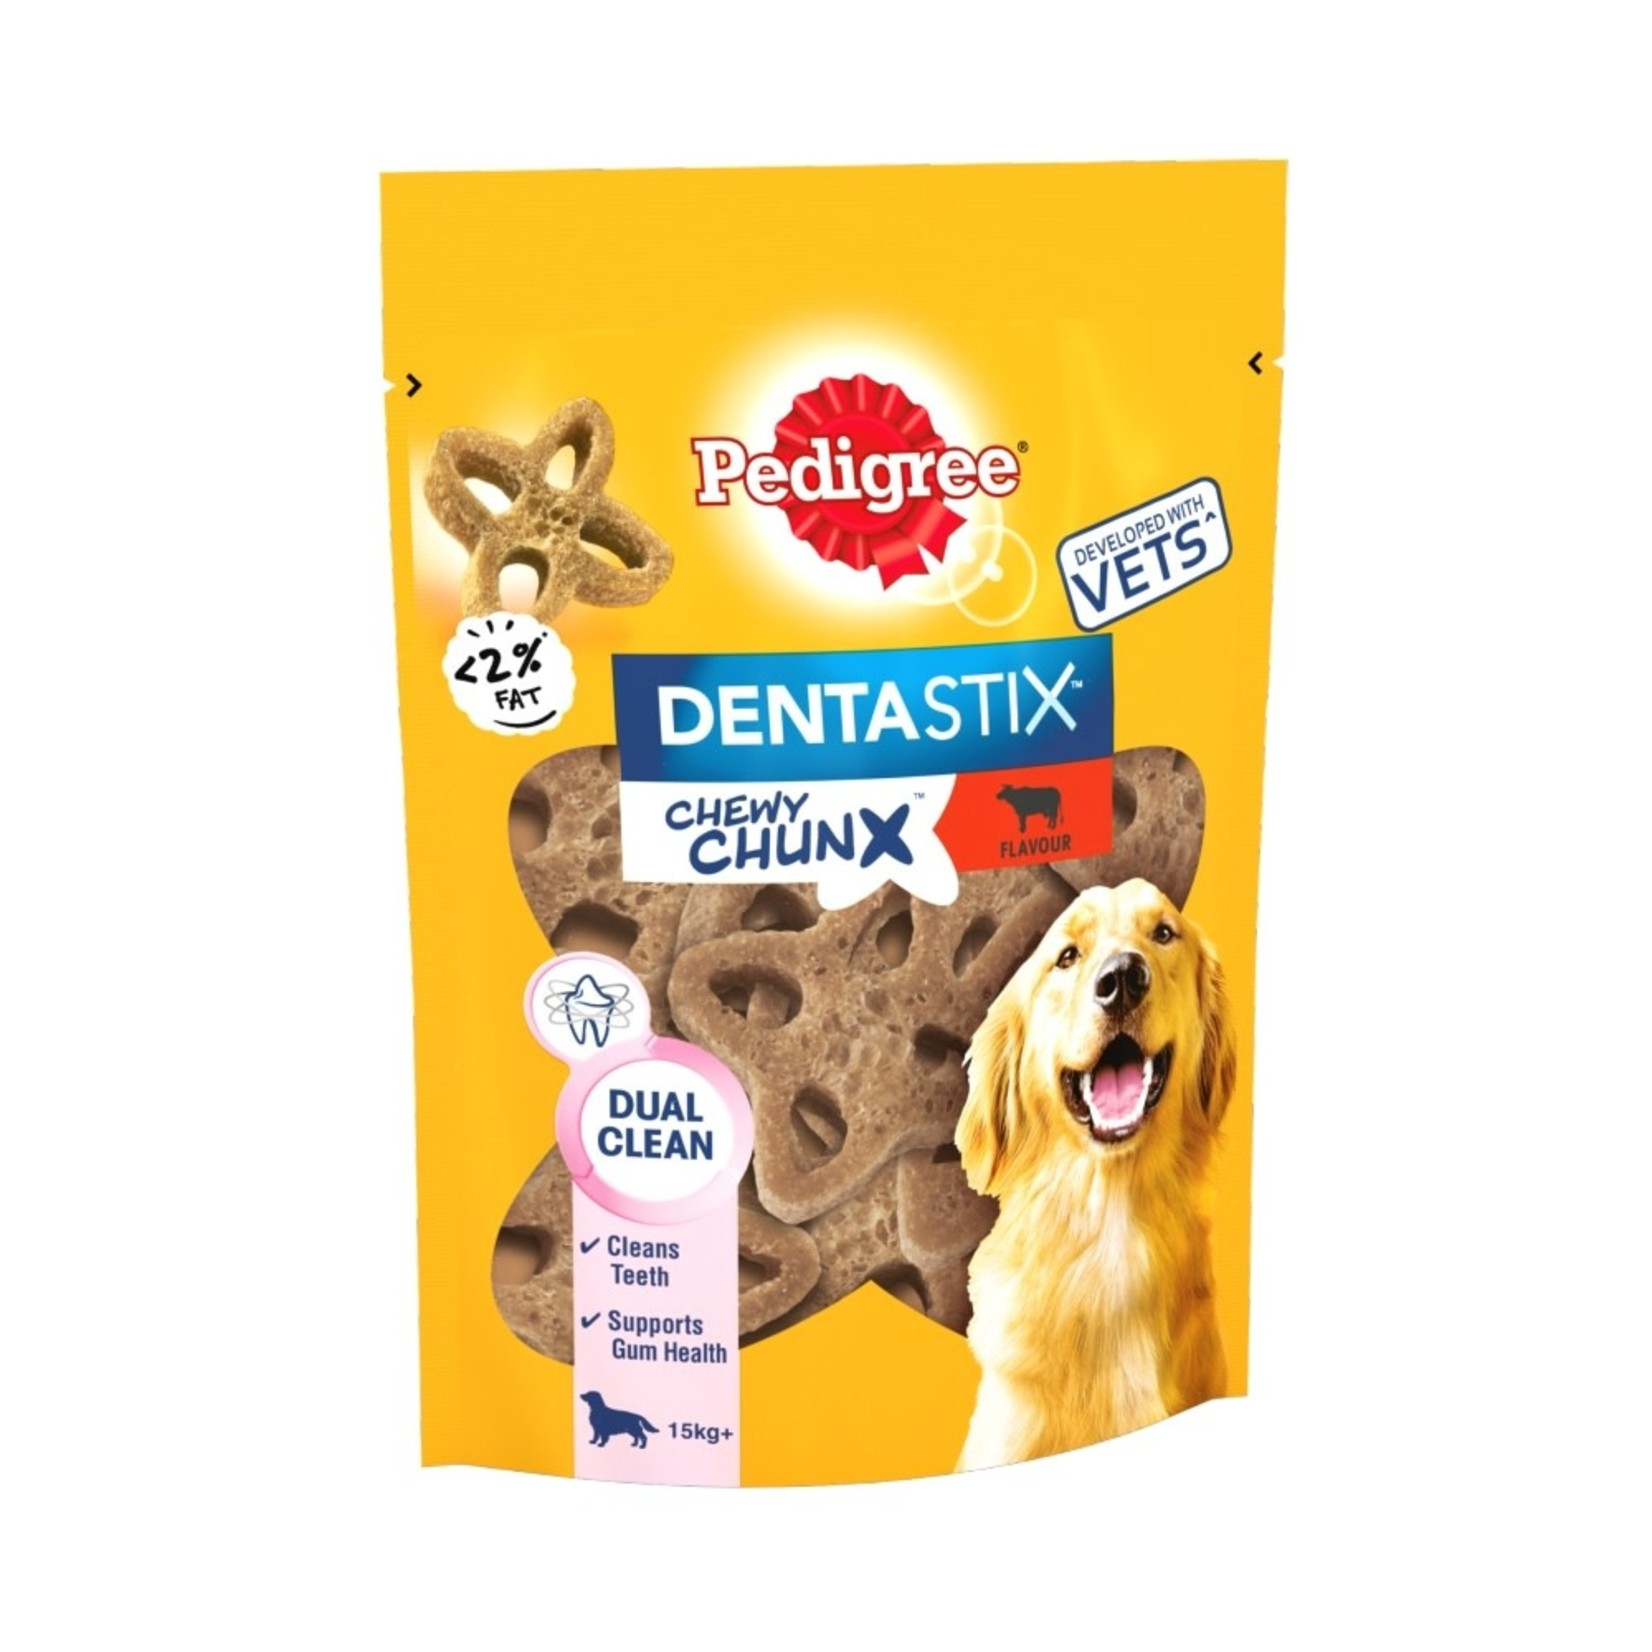 Pedigree Dentastix Chewy Chunx Maxi Dog Treats Beef Flavour, 68g